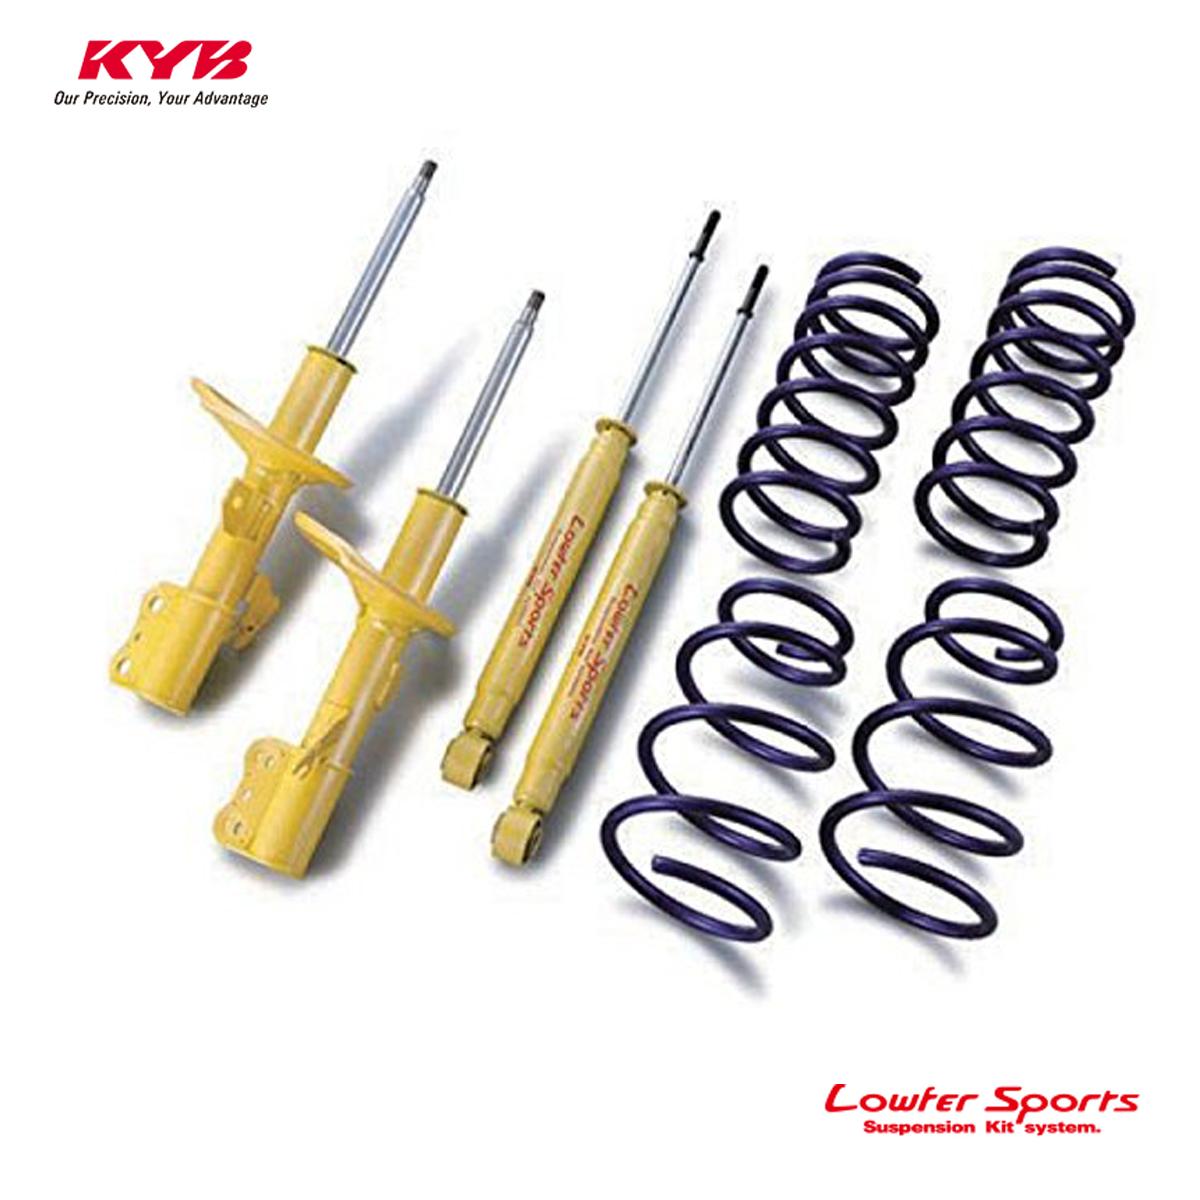 KYB カヤバ ヴォクシー ZRR80W ショックアブソーバー サスペンションキット Lowfer Sports LKIT-ZRR80W 配送先条件有り